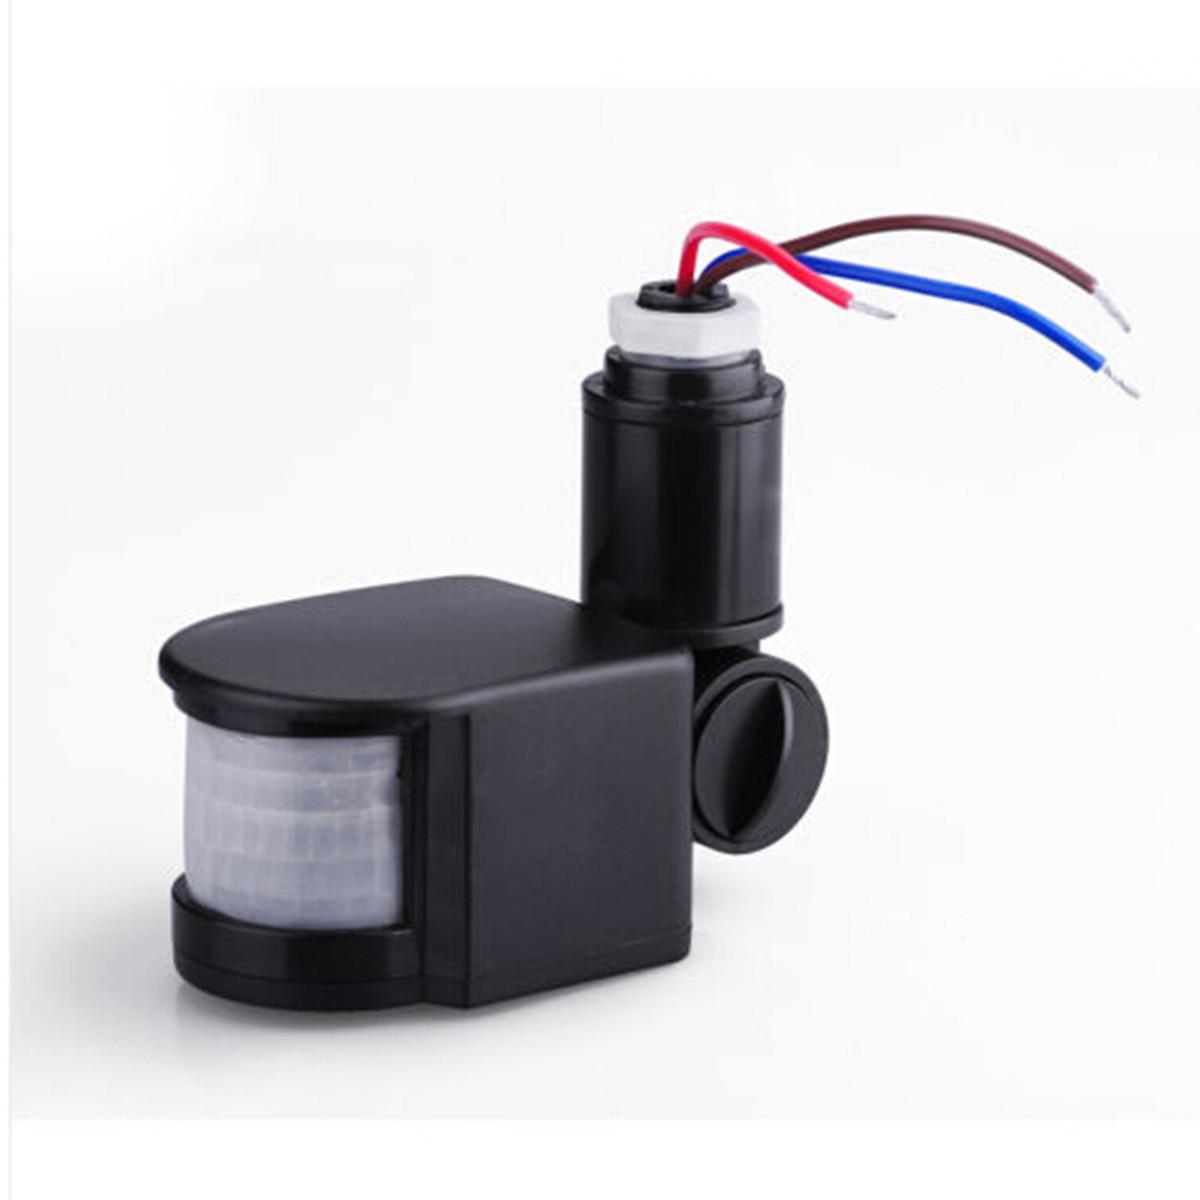 Outdoor LED Security Infrared PIR Motion Sensor Detector Wall Light 140? New eBay